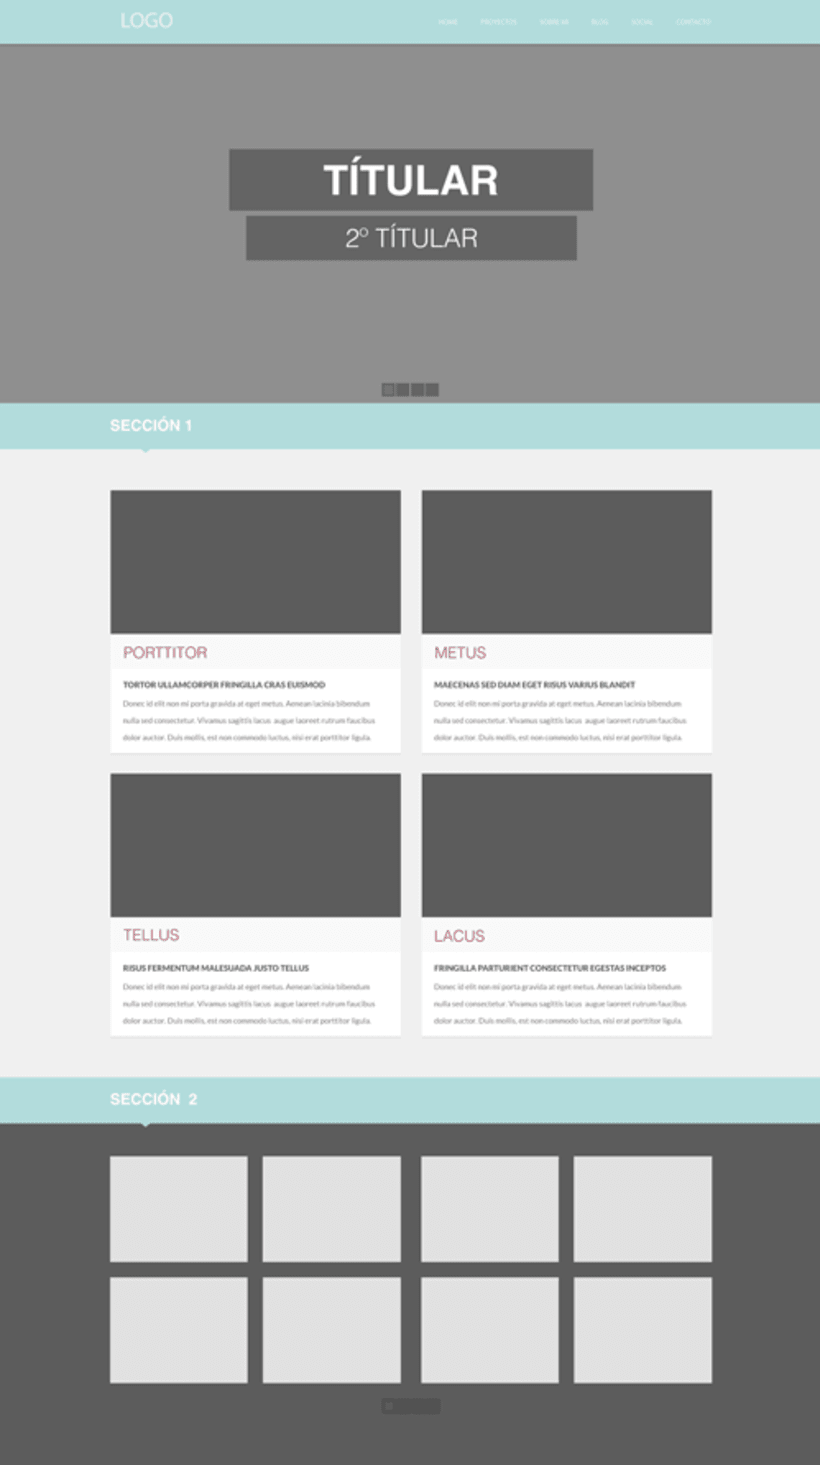 Diseño web - Plantilla Cantor | Domestika